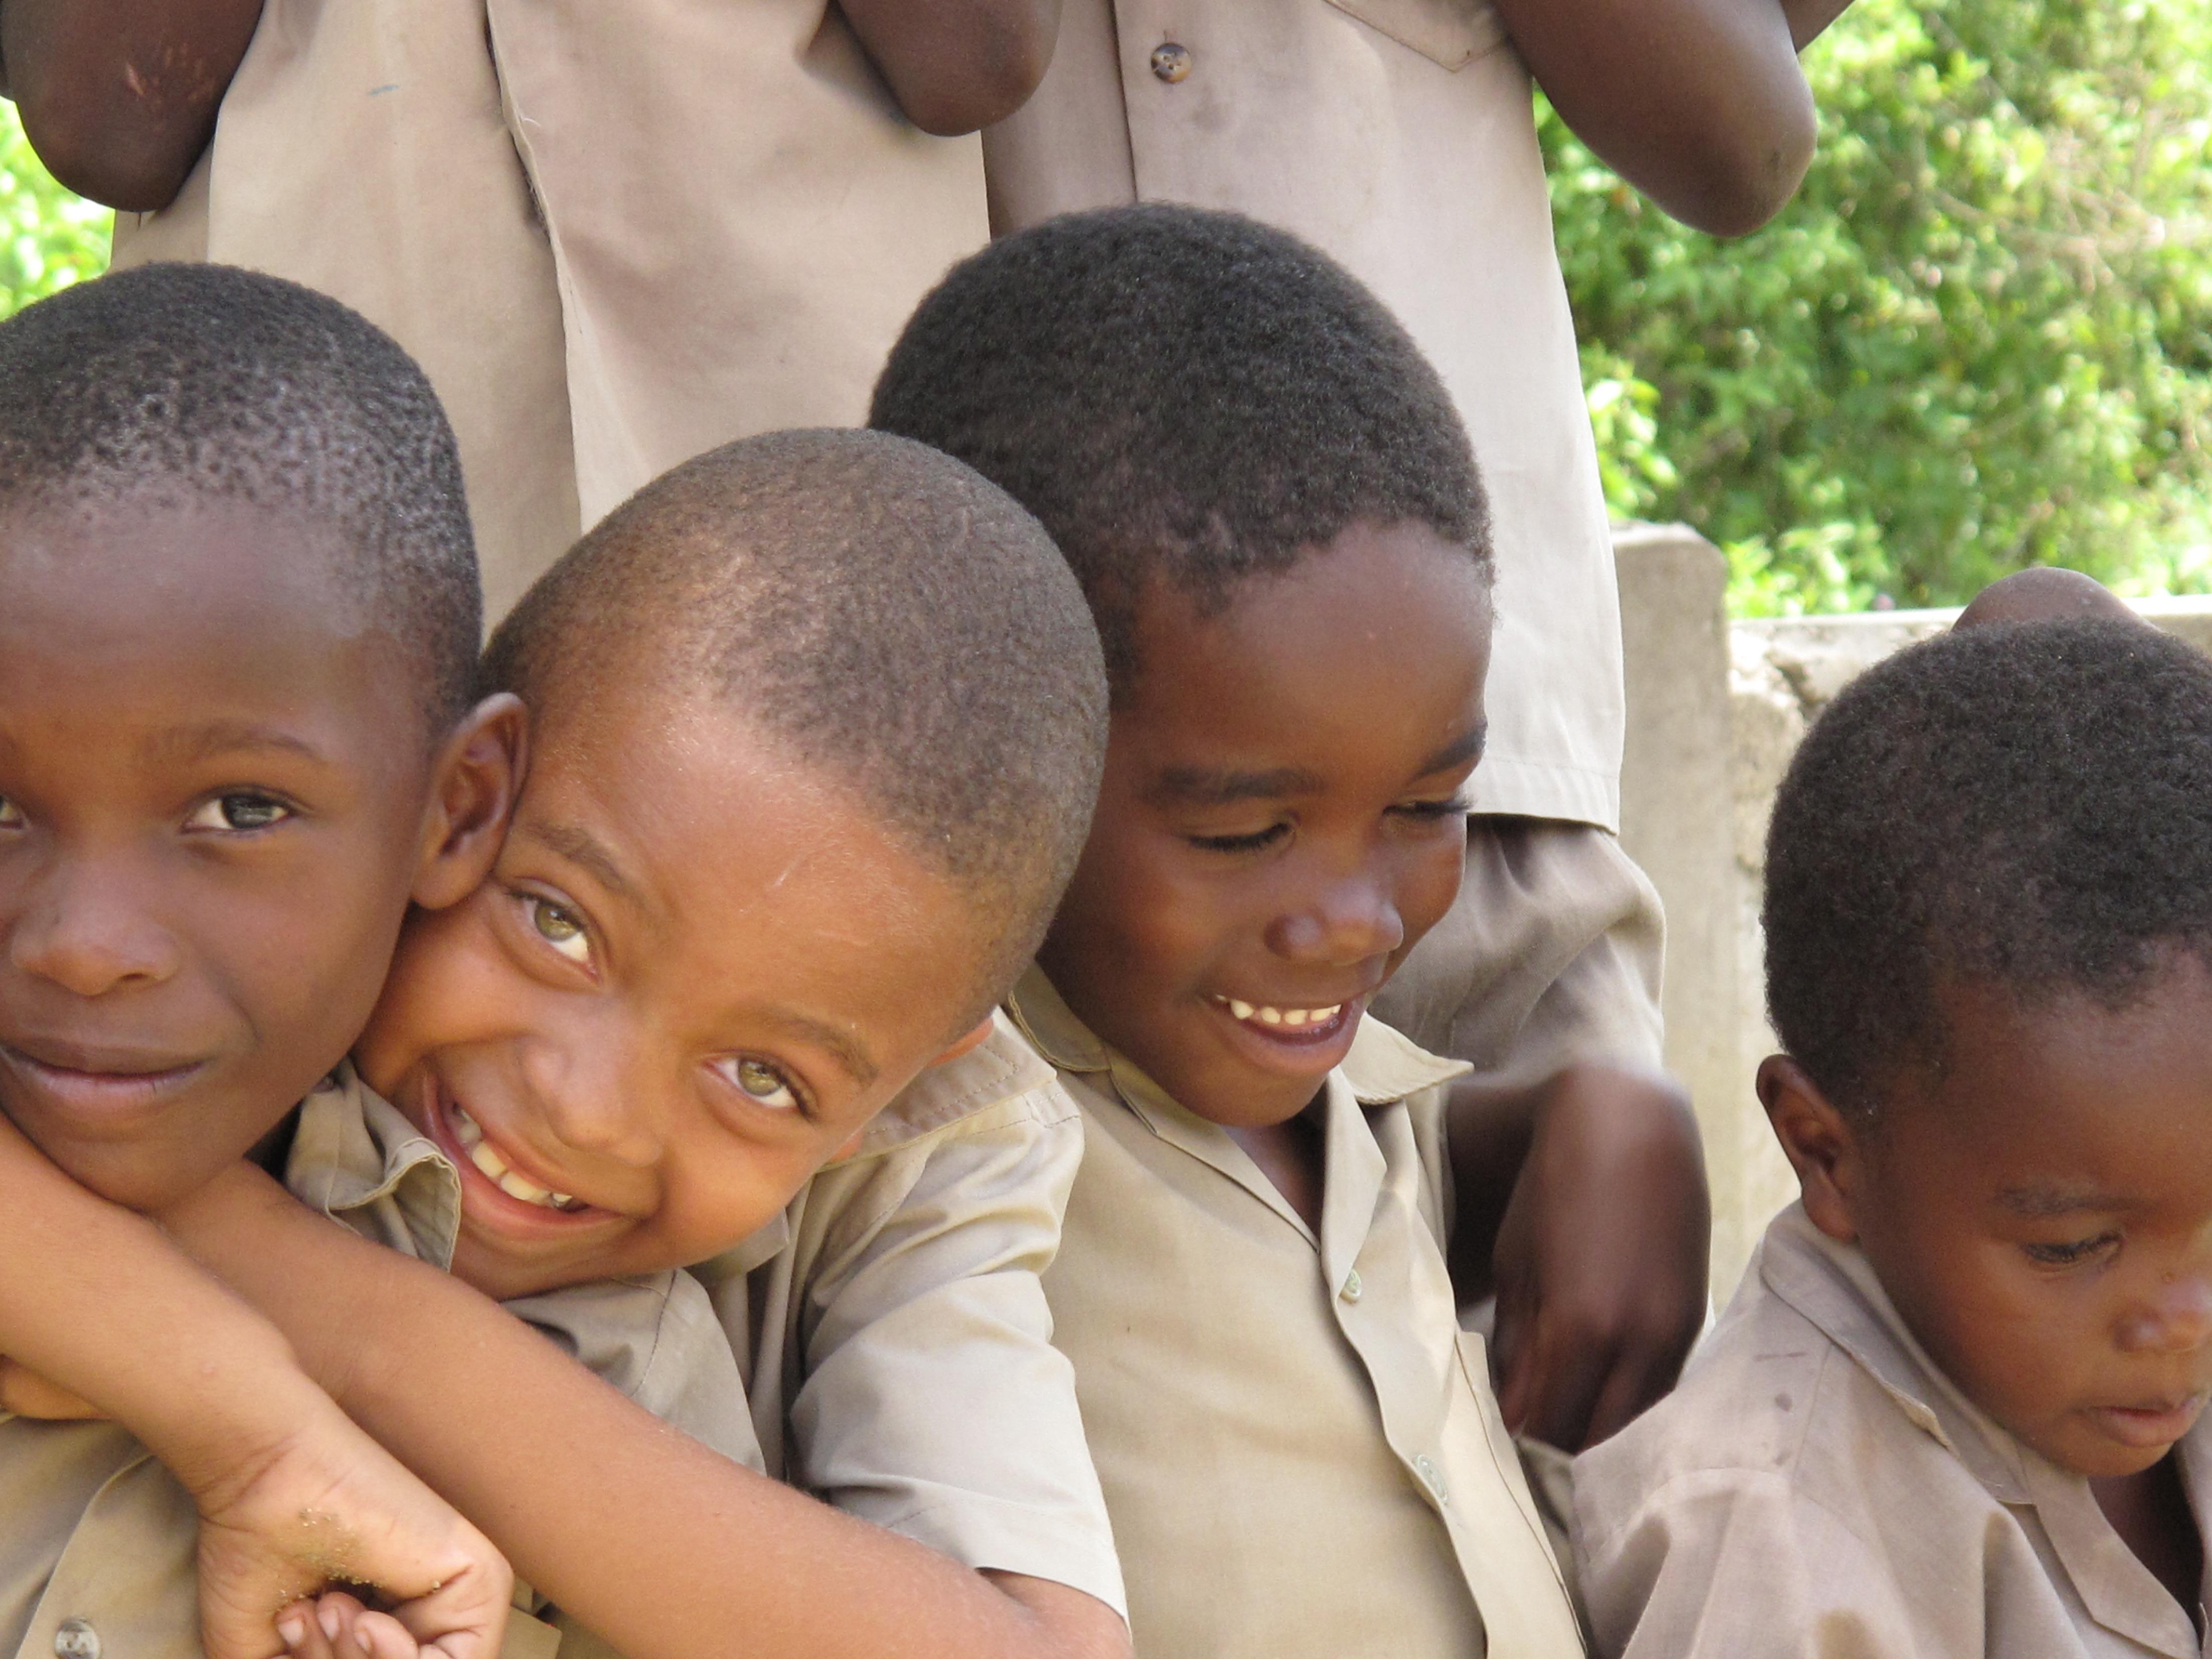 jamaica boys smiling children child hugging education cute happy person outside portrait infant domain